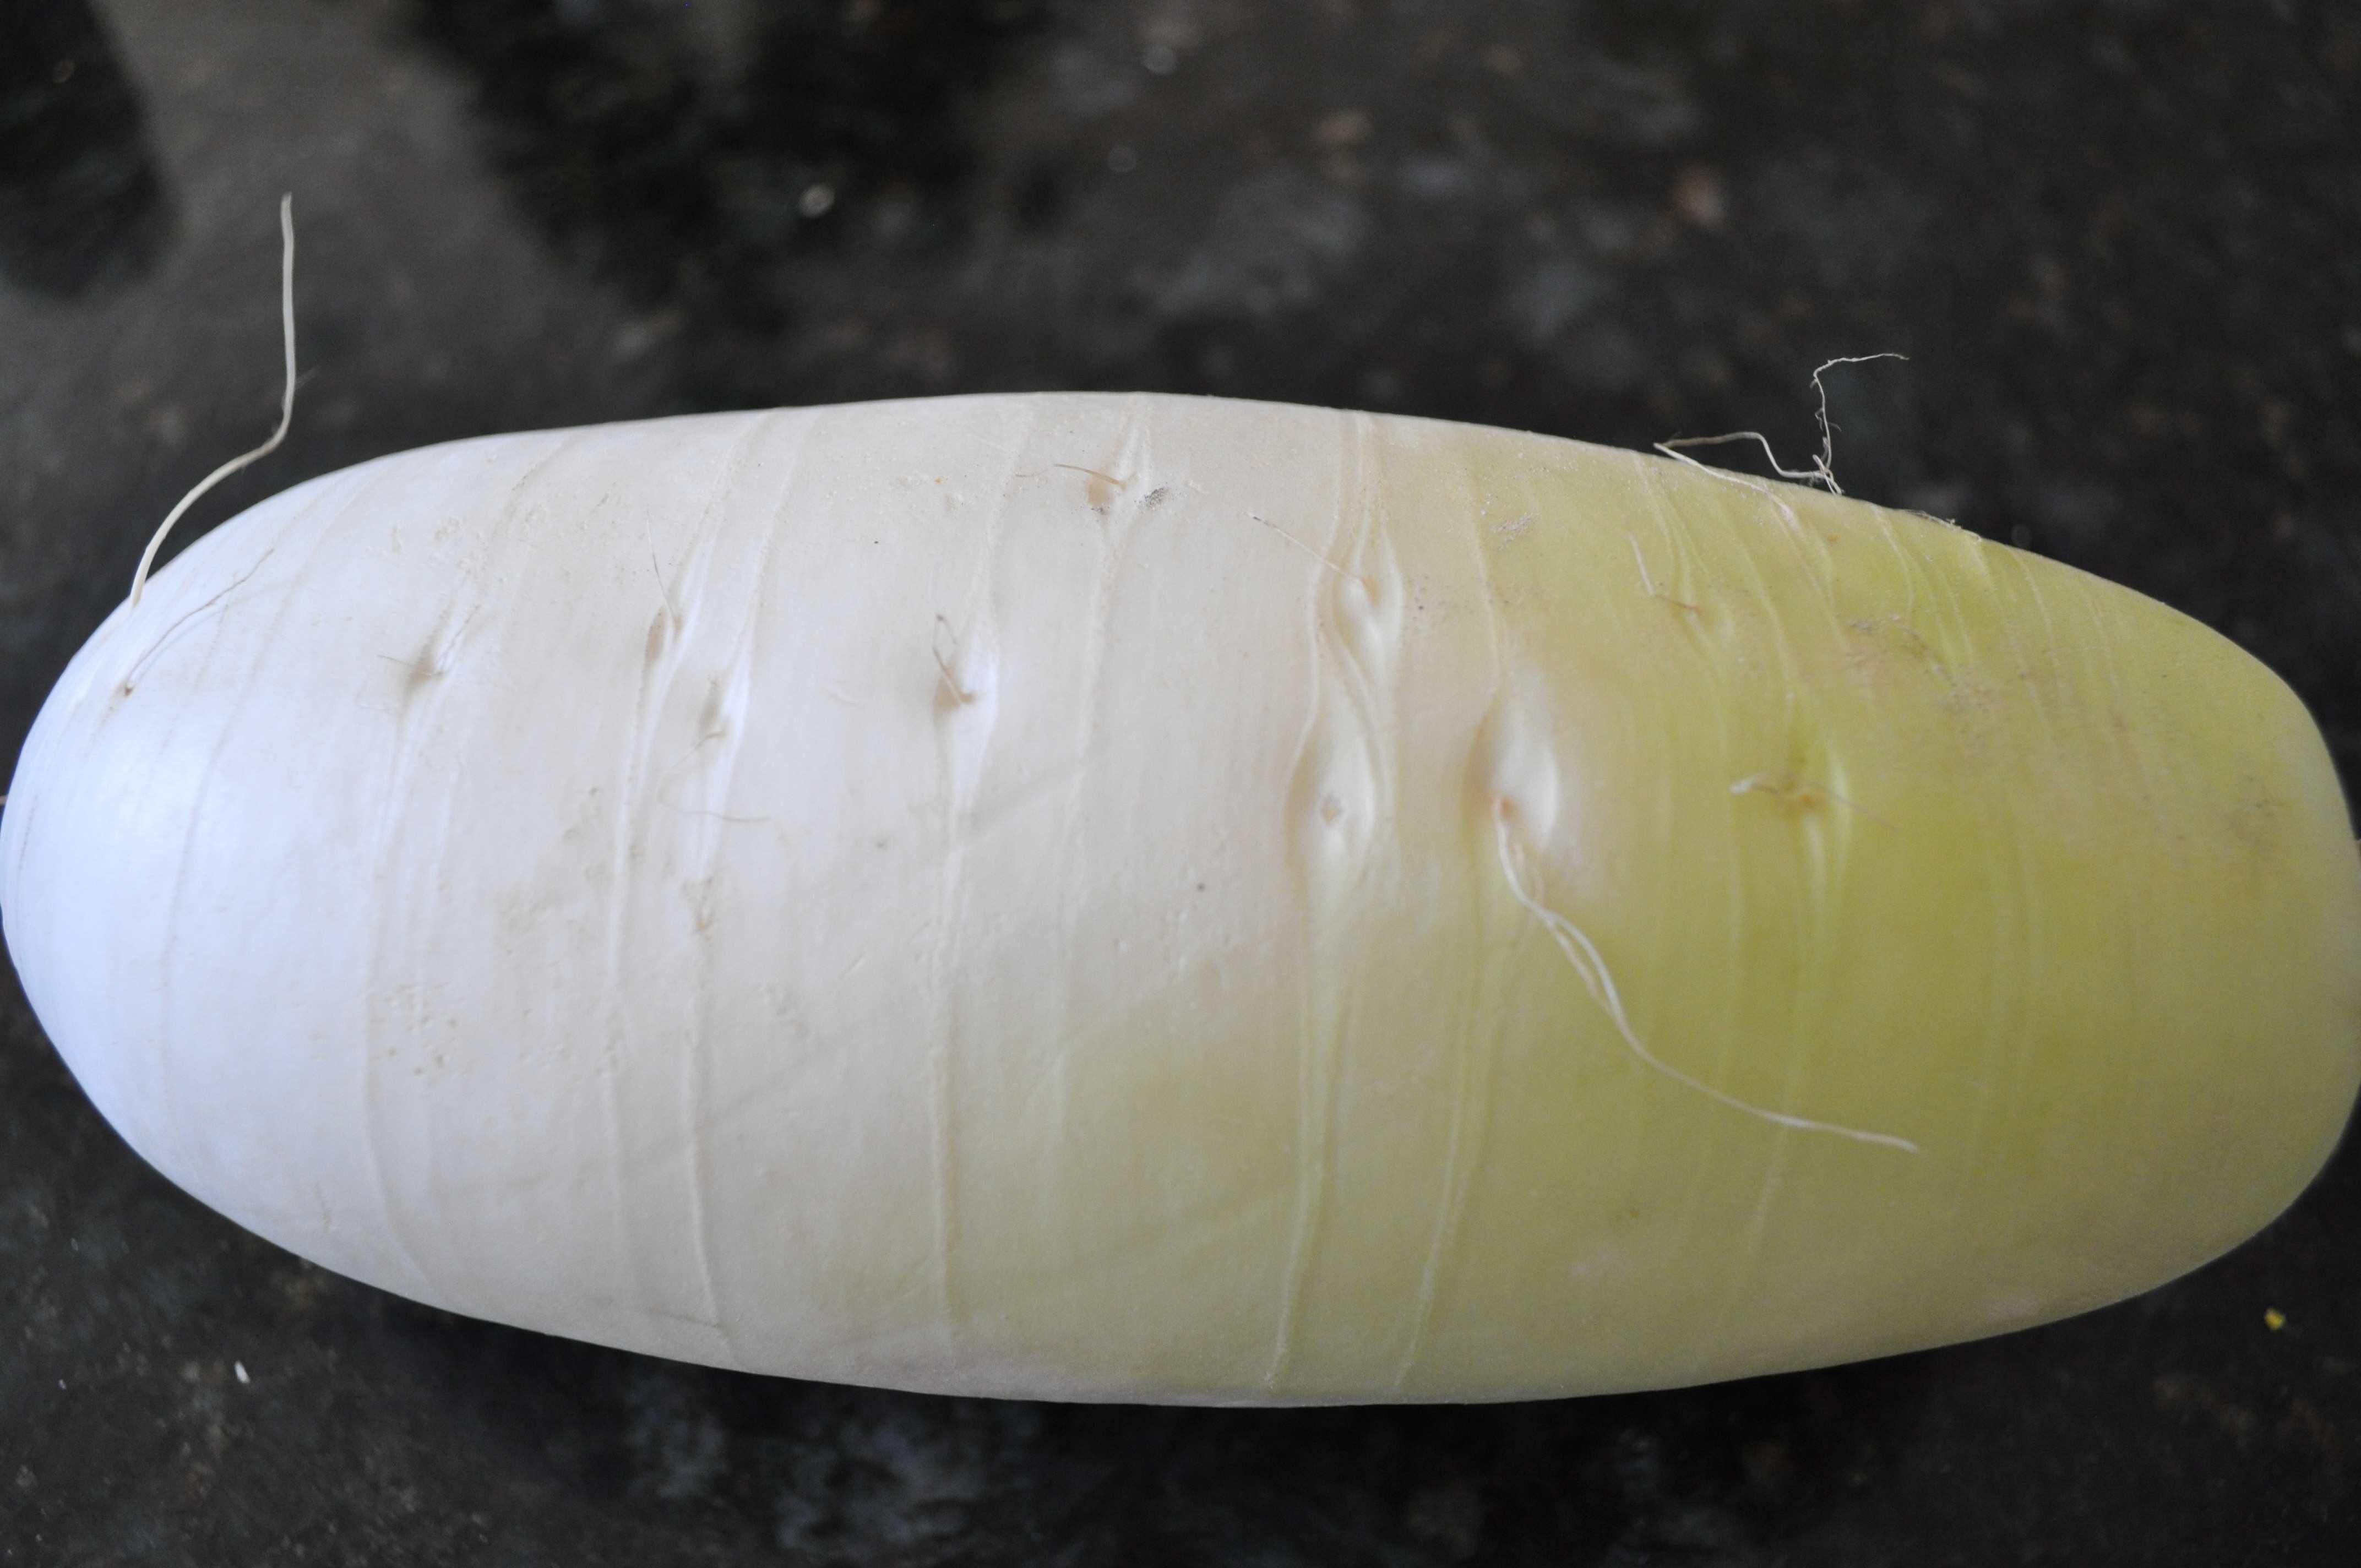 Korean Moo(radish)